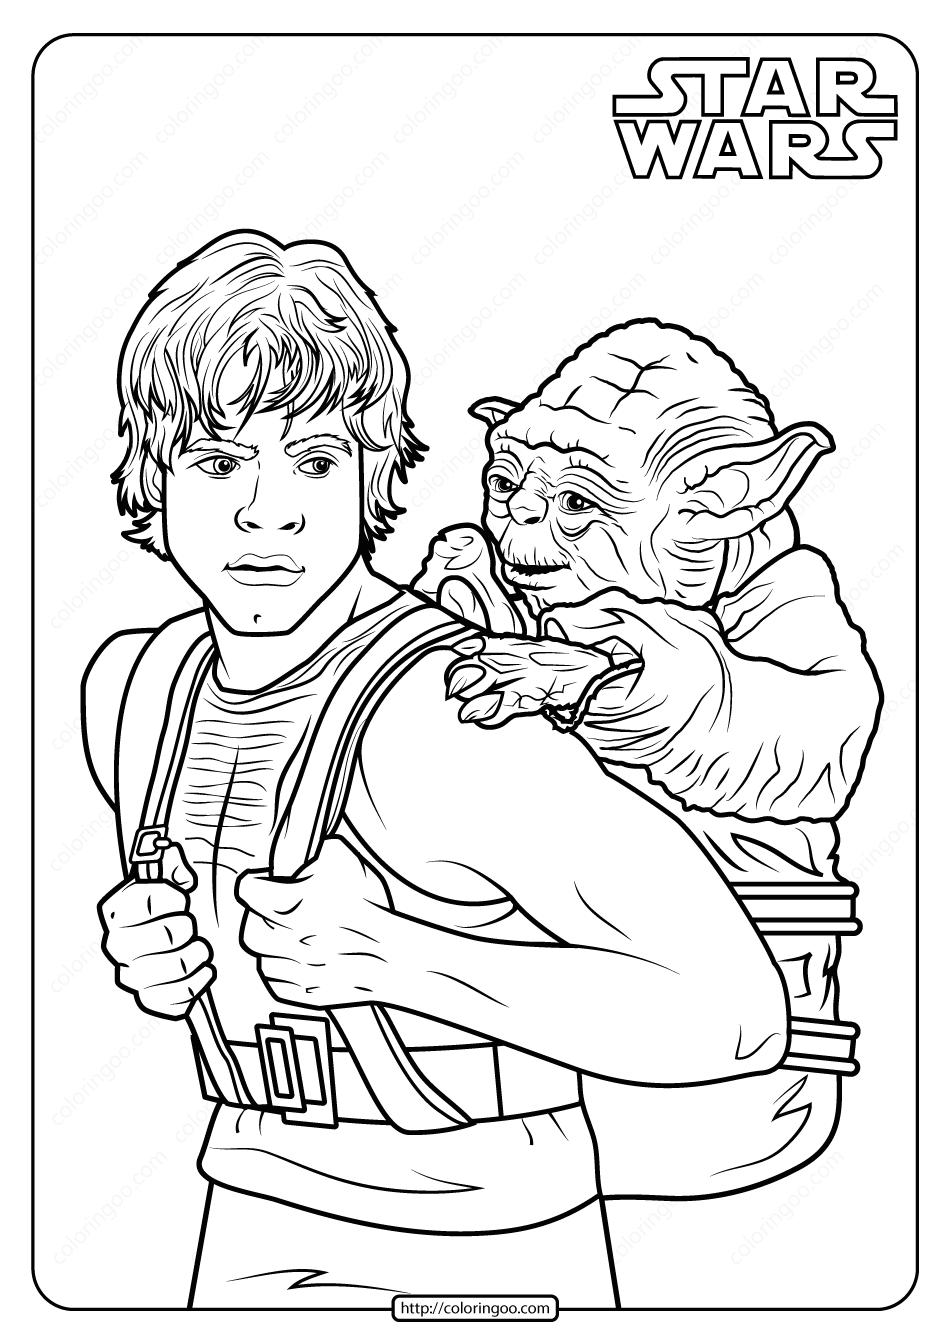 Printable Star Wars Luke And Yoda Coloring Pages Star Wars Coloring Sheet Star Wars Drawings Star Wars Activities